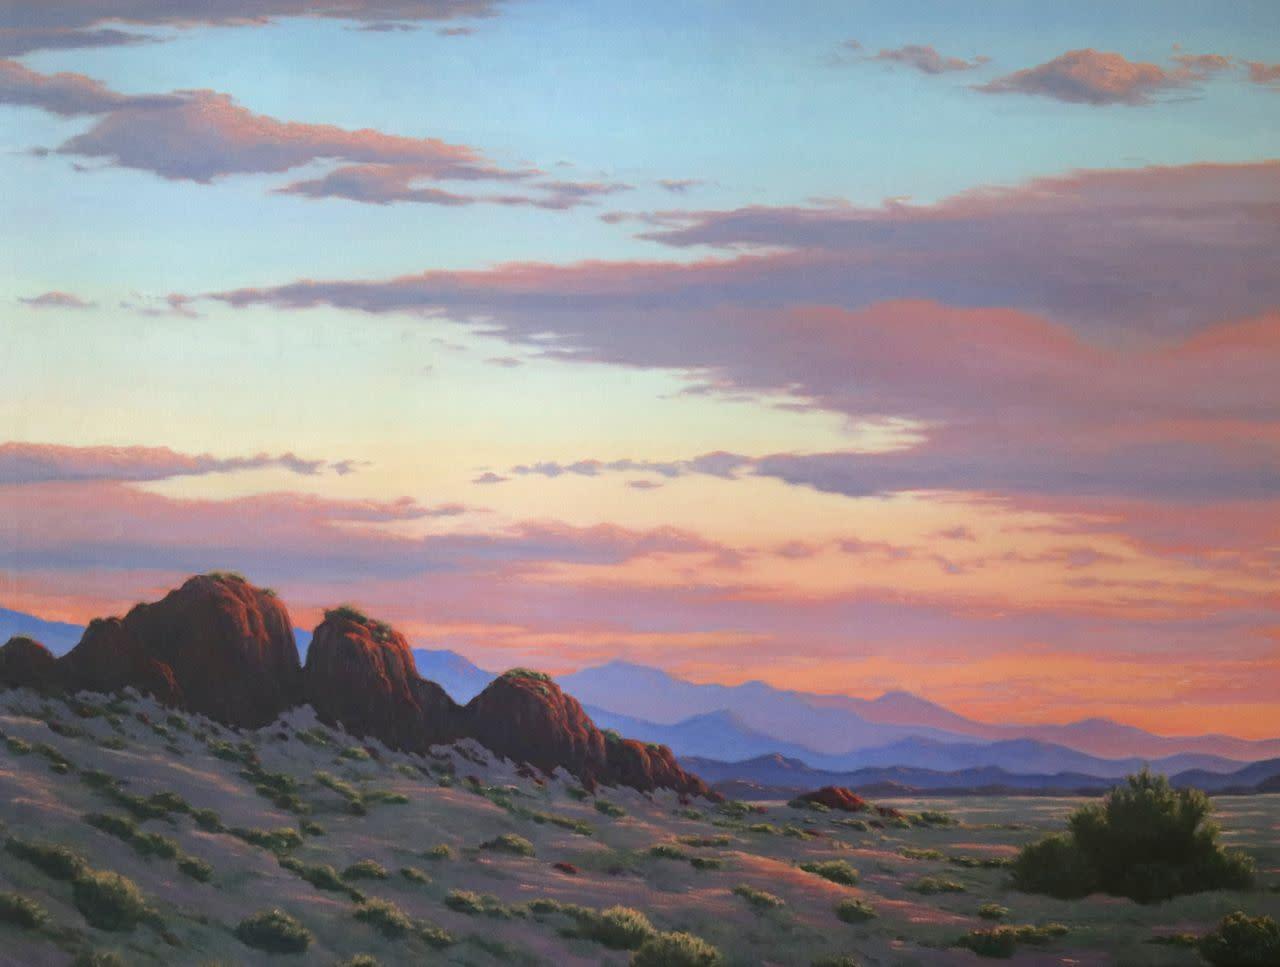 Desert mountain sunset auggtm